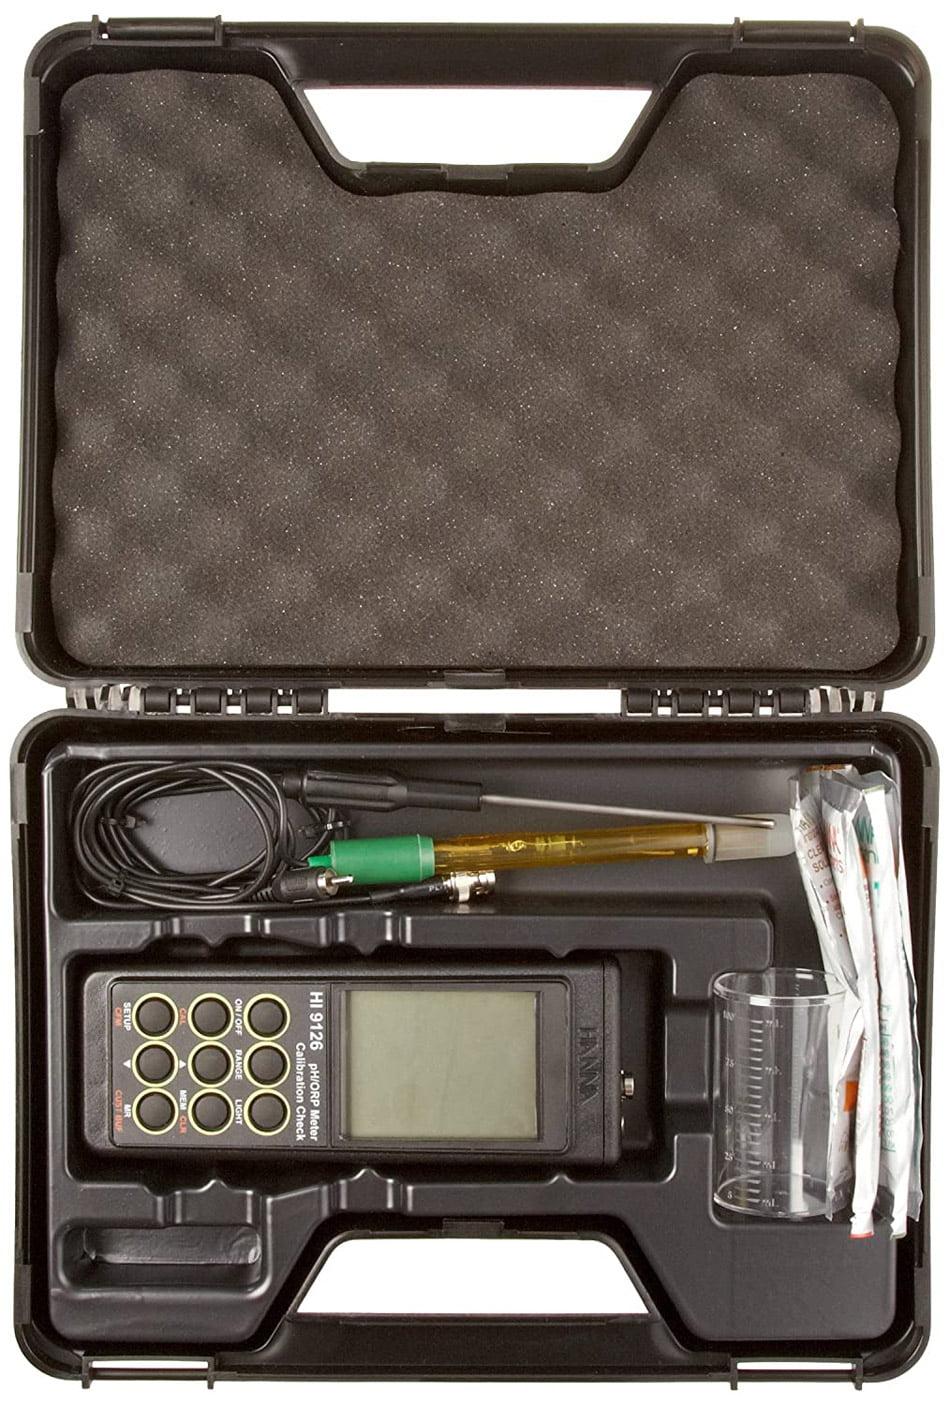 HI9126 อุปกรณ์พร้อมใช้งาน